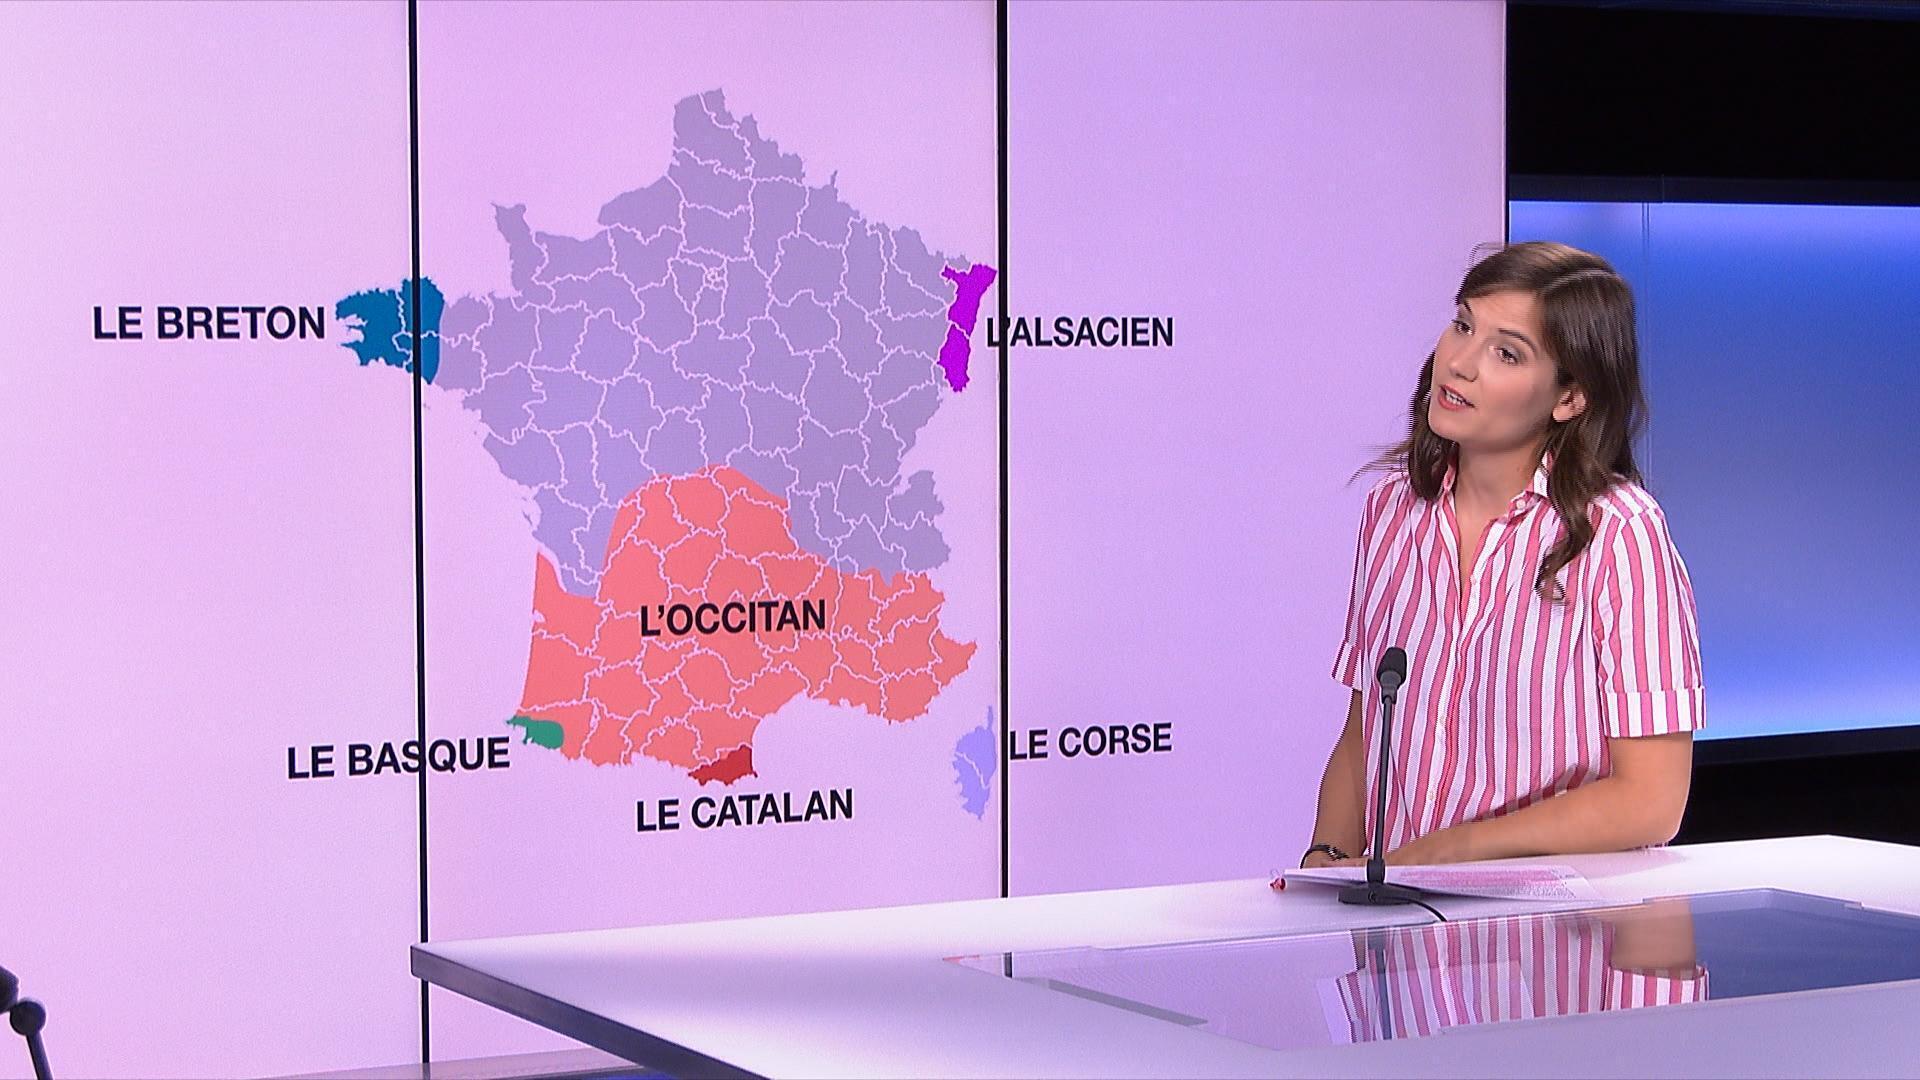 FR NEWS SEMAINE26_08_2021 11_59_30.Sub.01